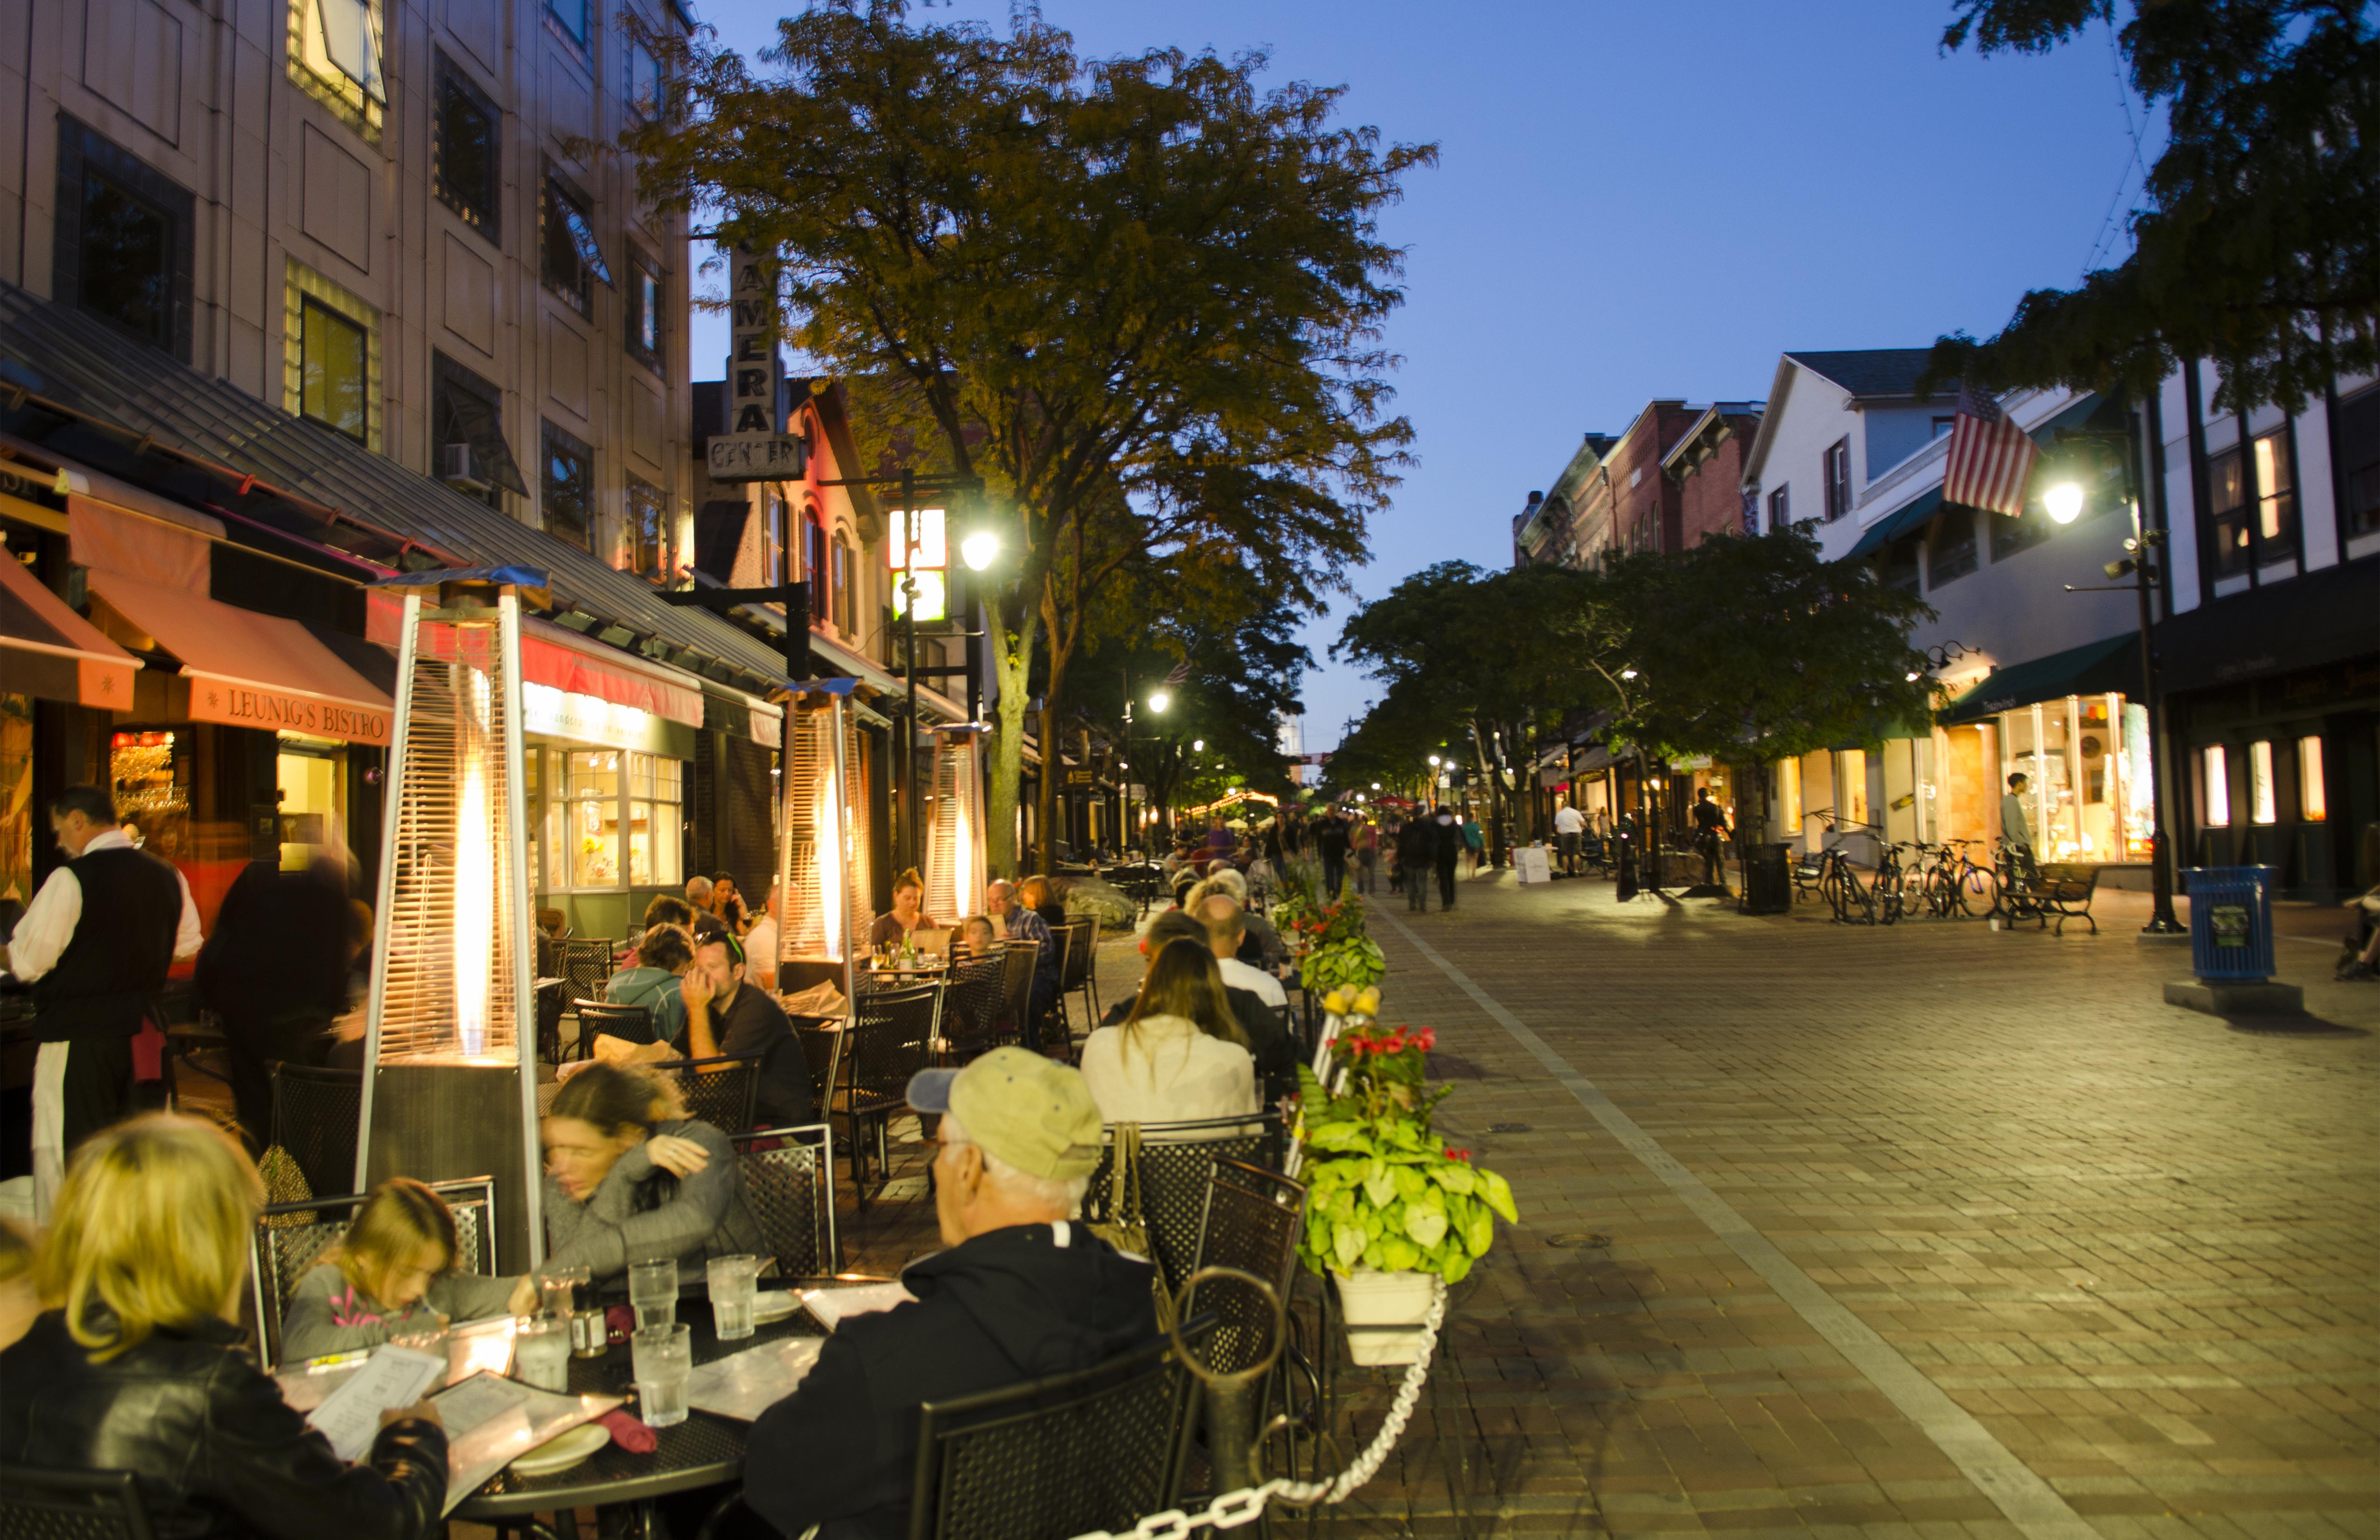 Burlington, Vermont, Church Street downtown with restaurants and tourists